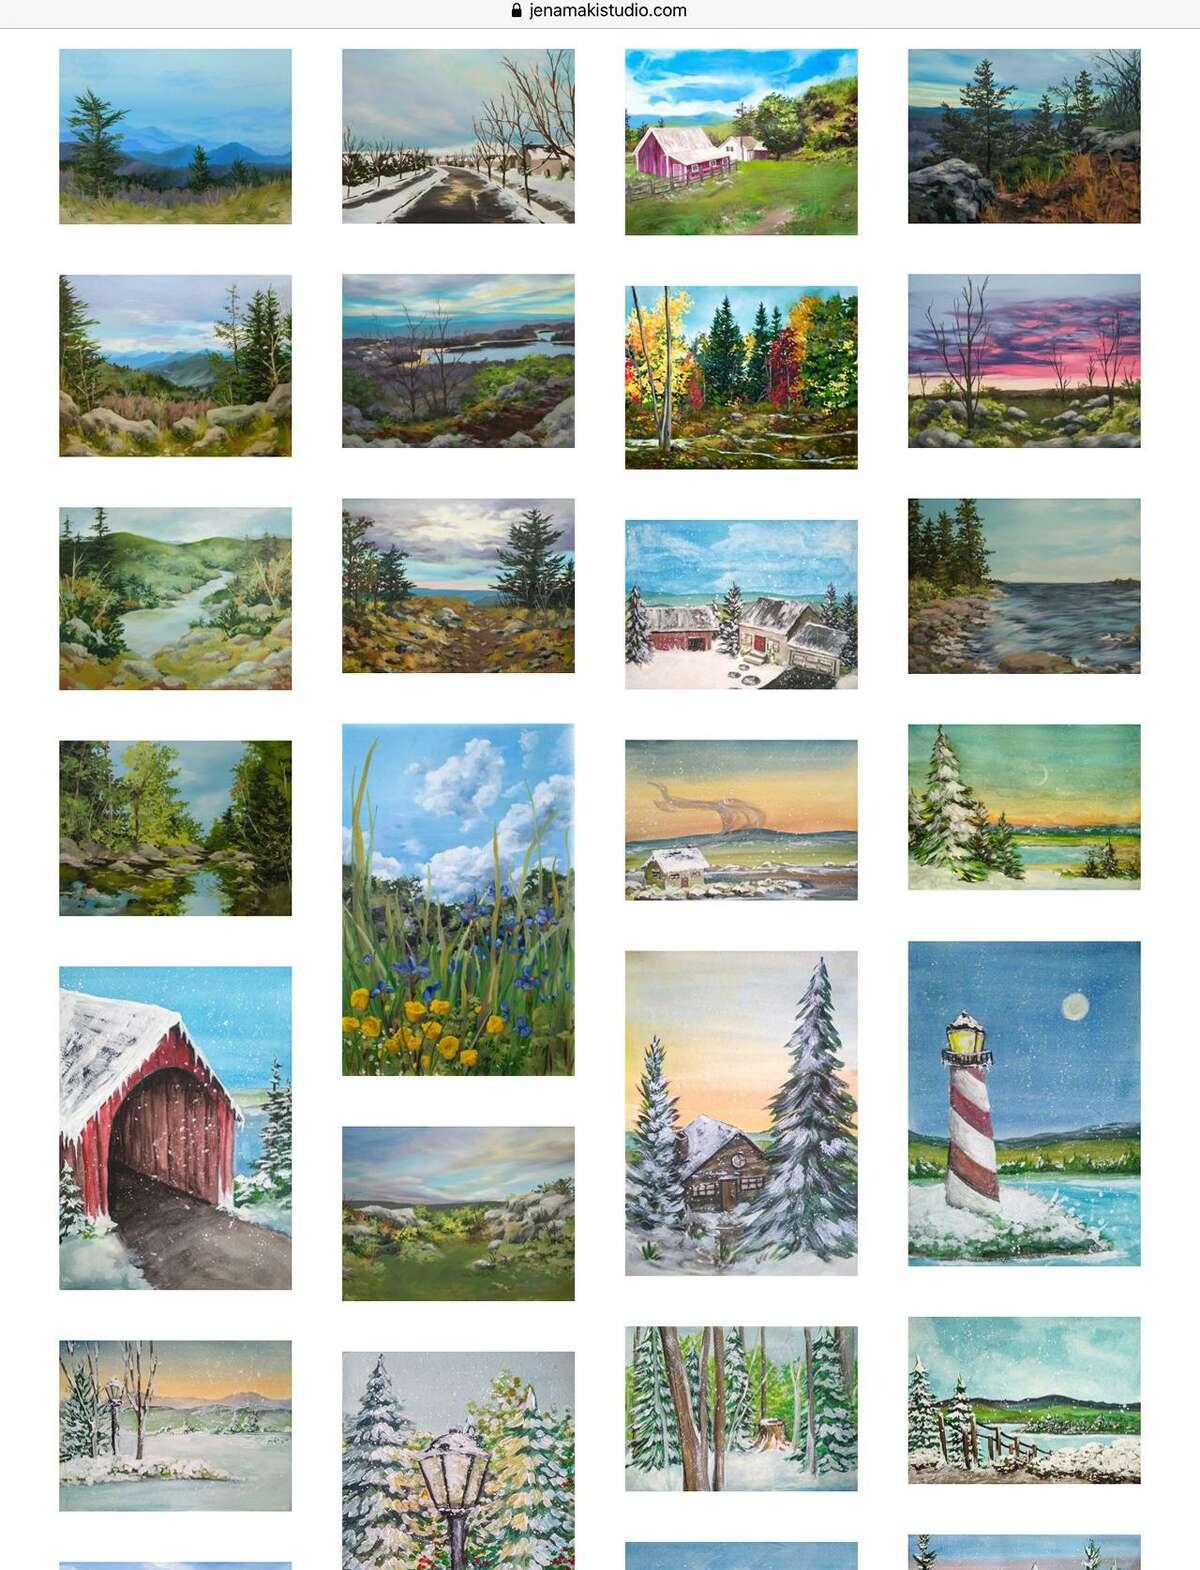 Landscape painting collection by artist Jena Maki.